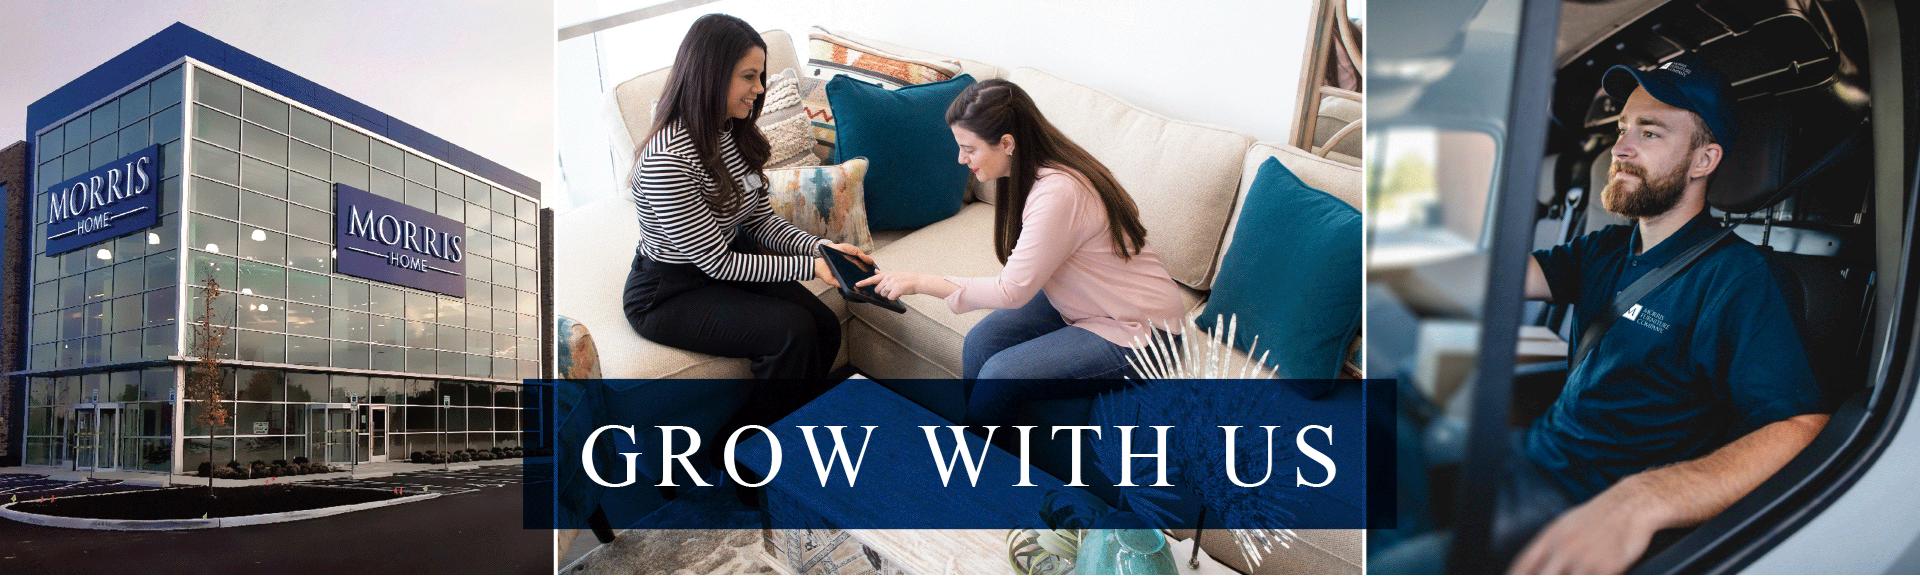 Grow With Us Desktop